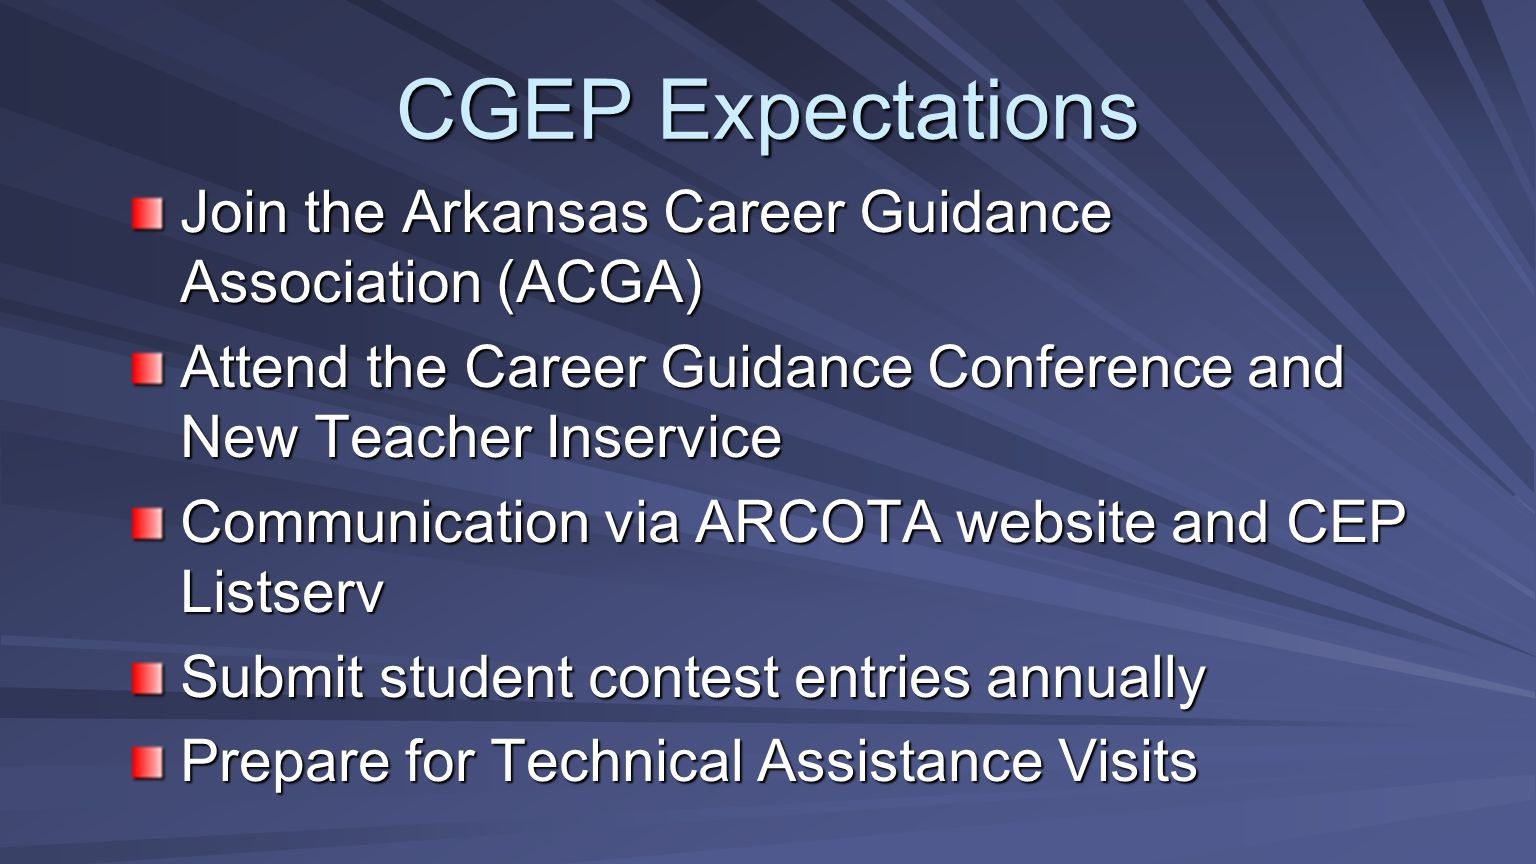 CGEP Expectations Join the Arkansas Career Guidance Association (ACGA)